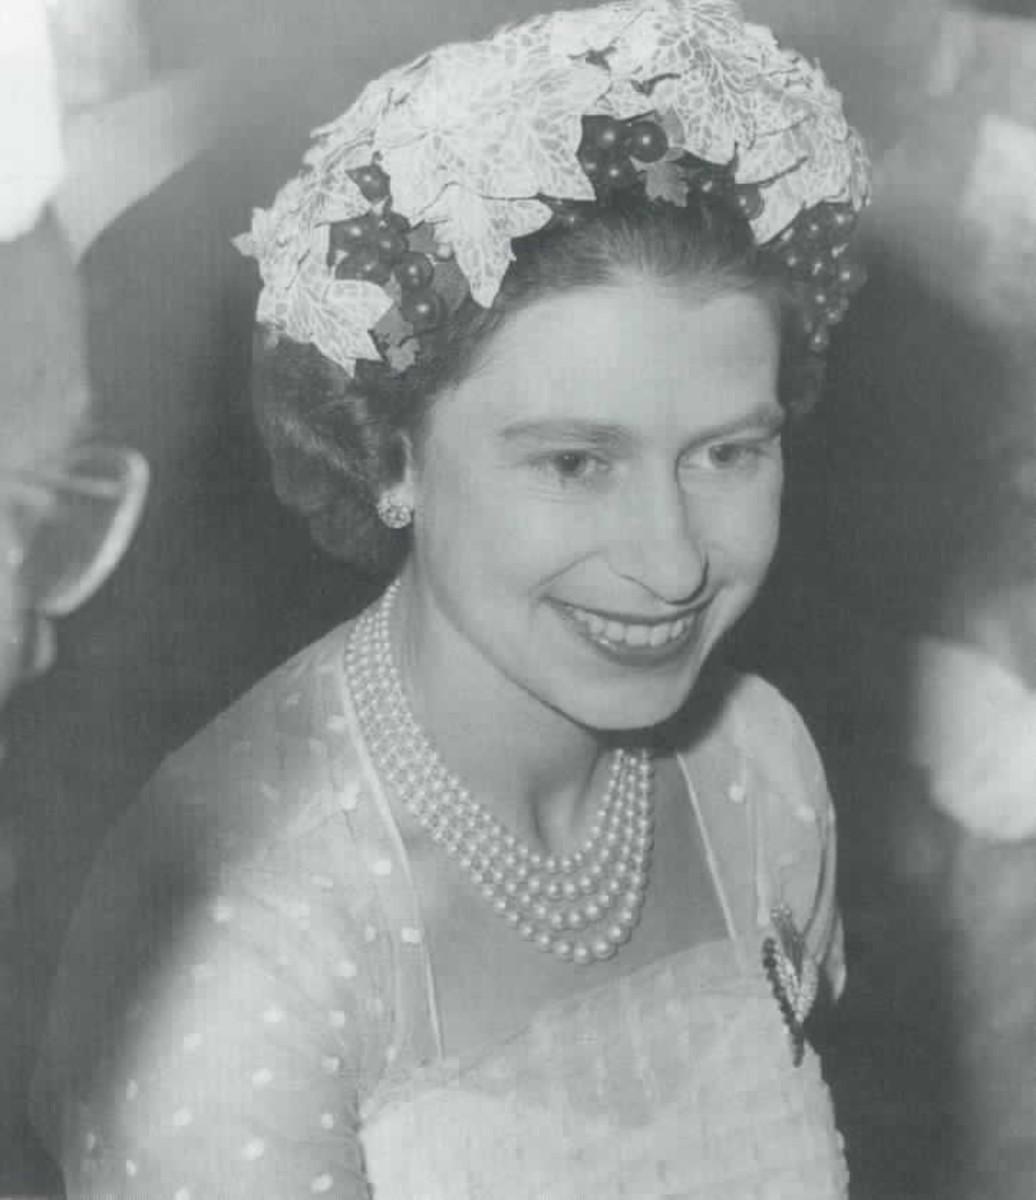 Queen Elizabeth, as a young Queen, loved her pearls.